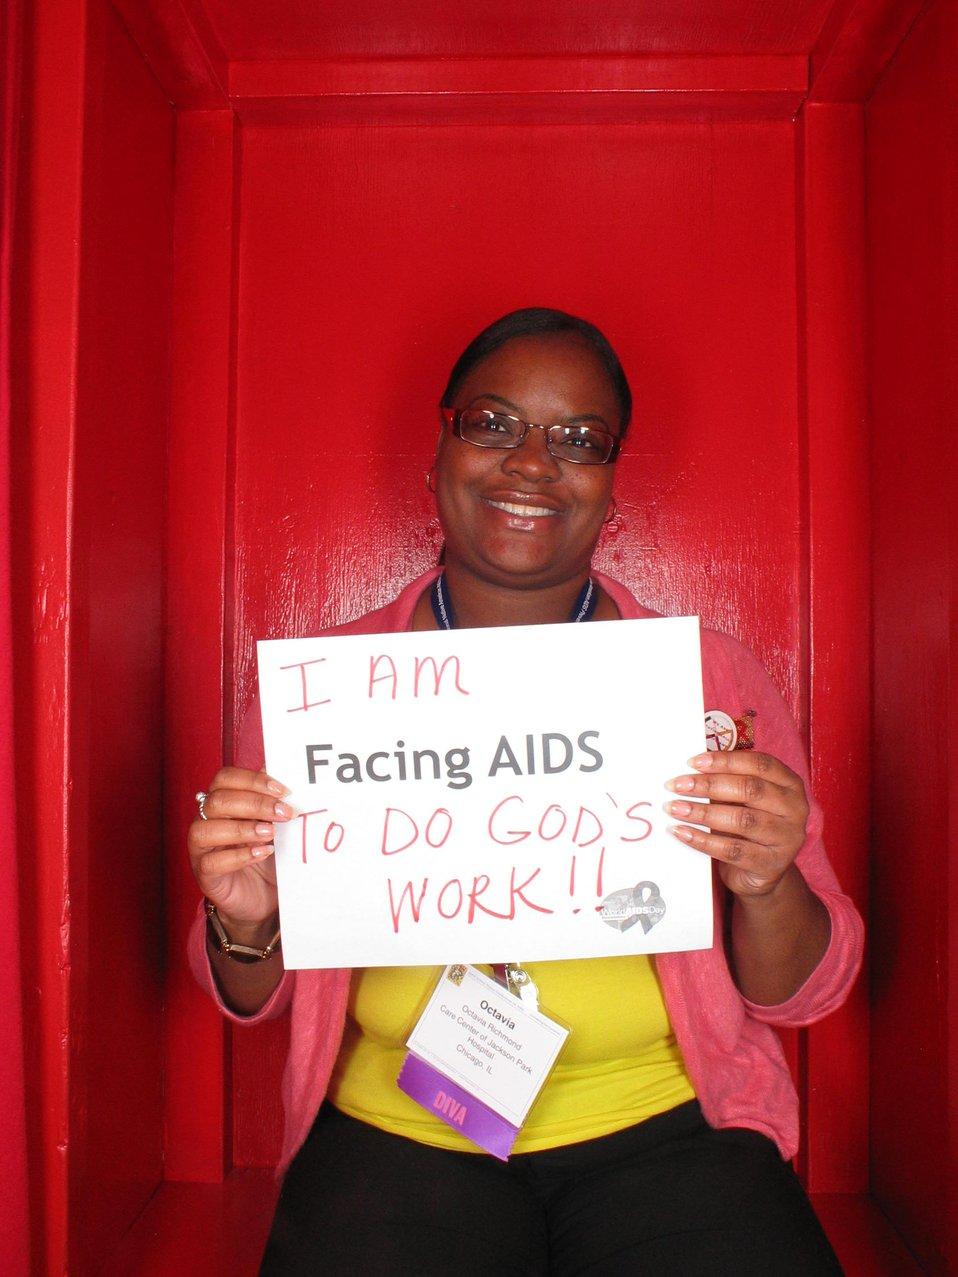 I am Facing AIDS to do God's work!!